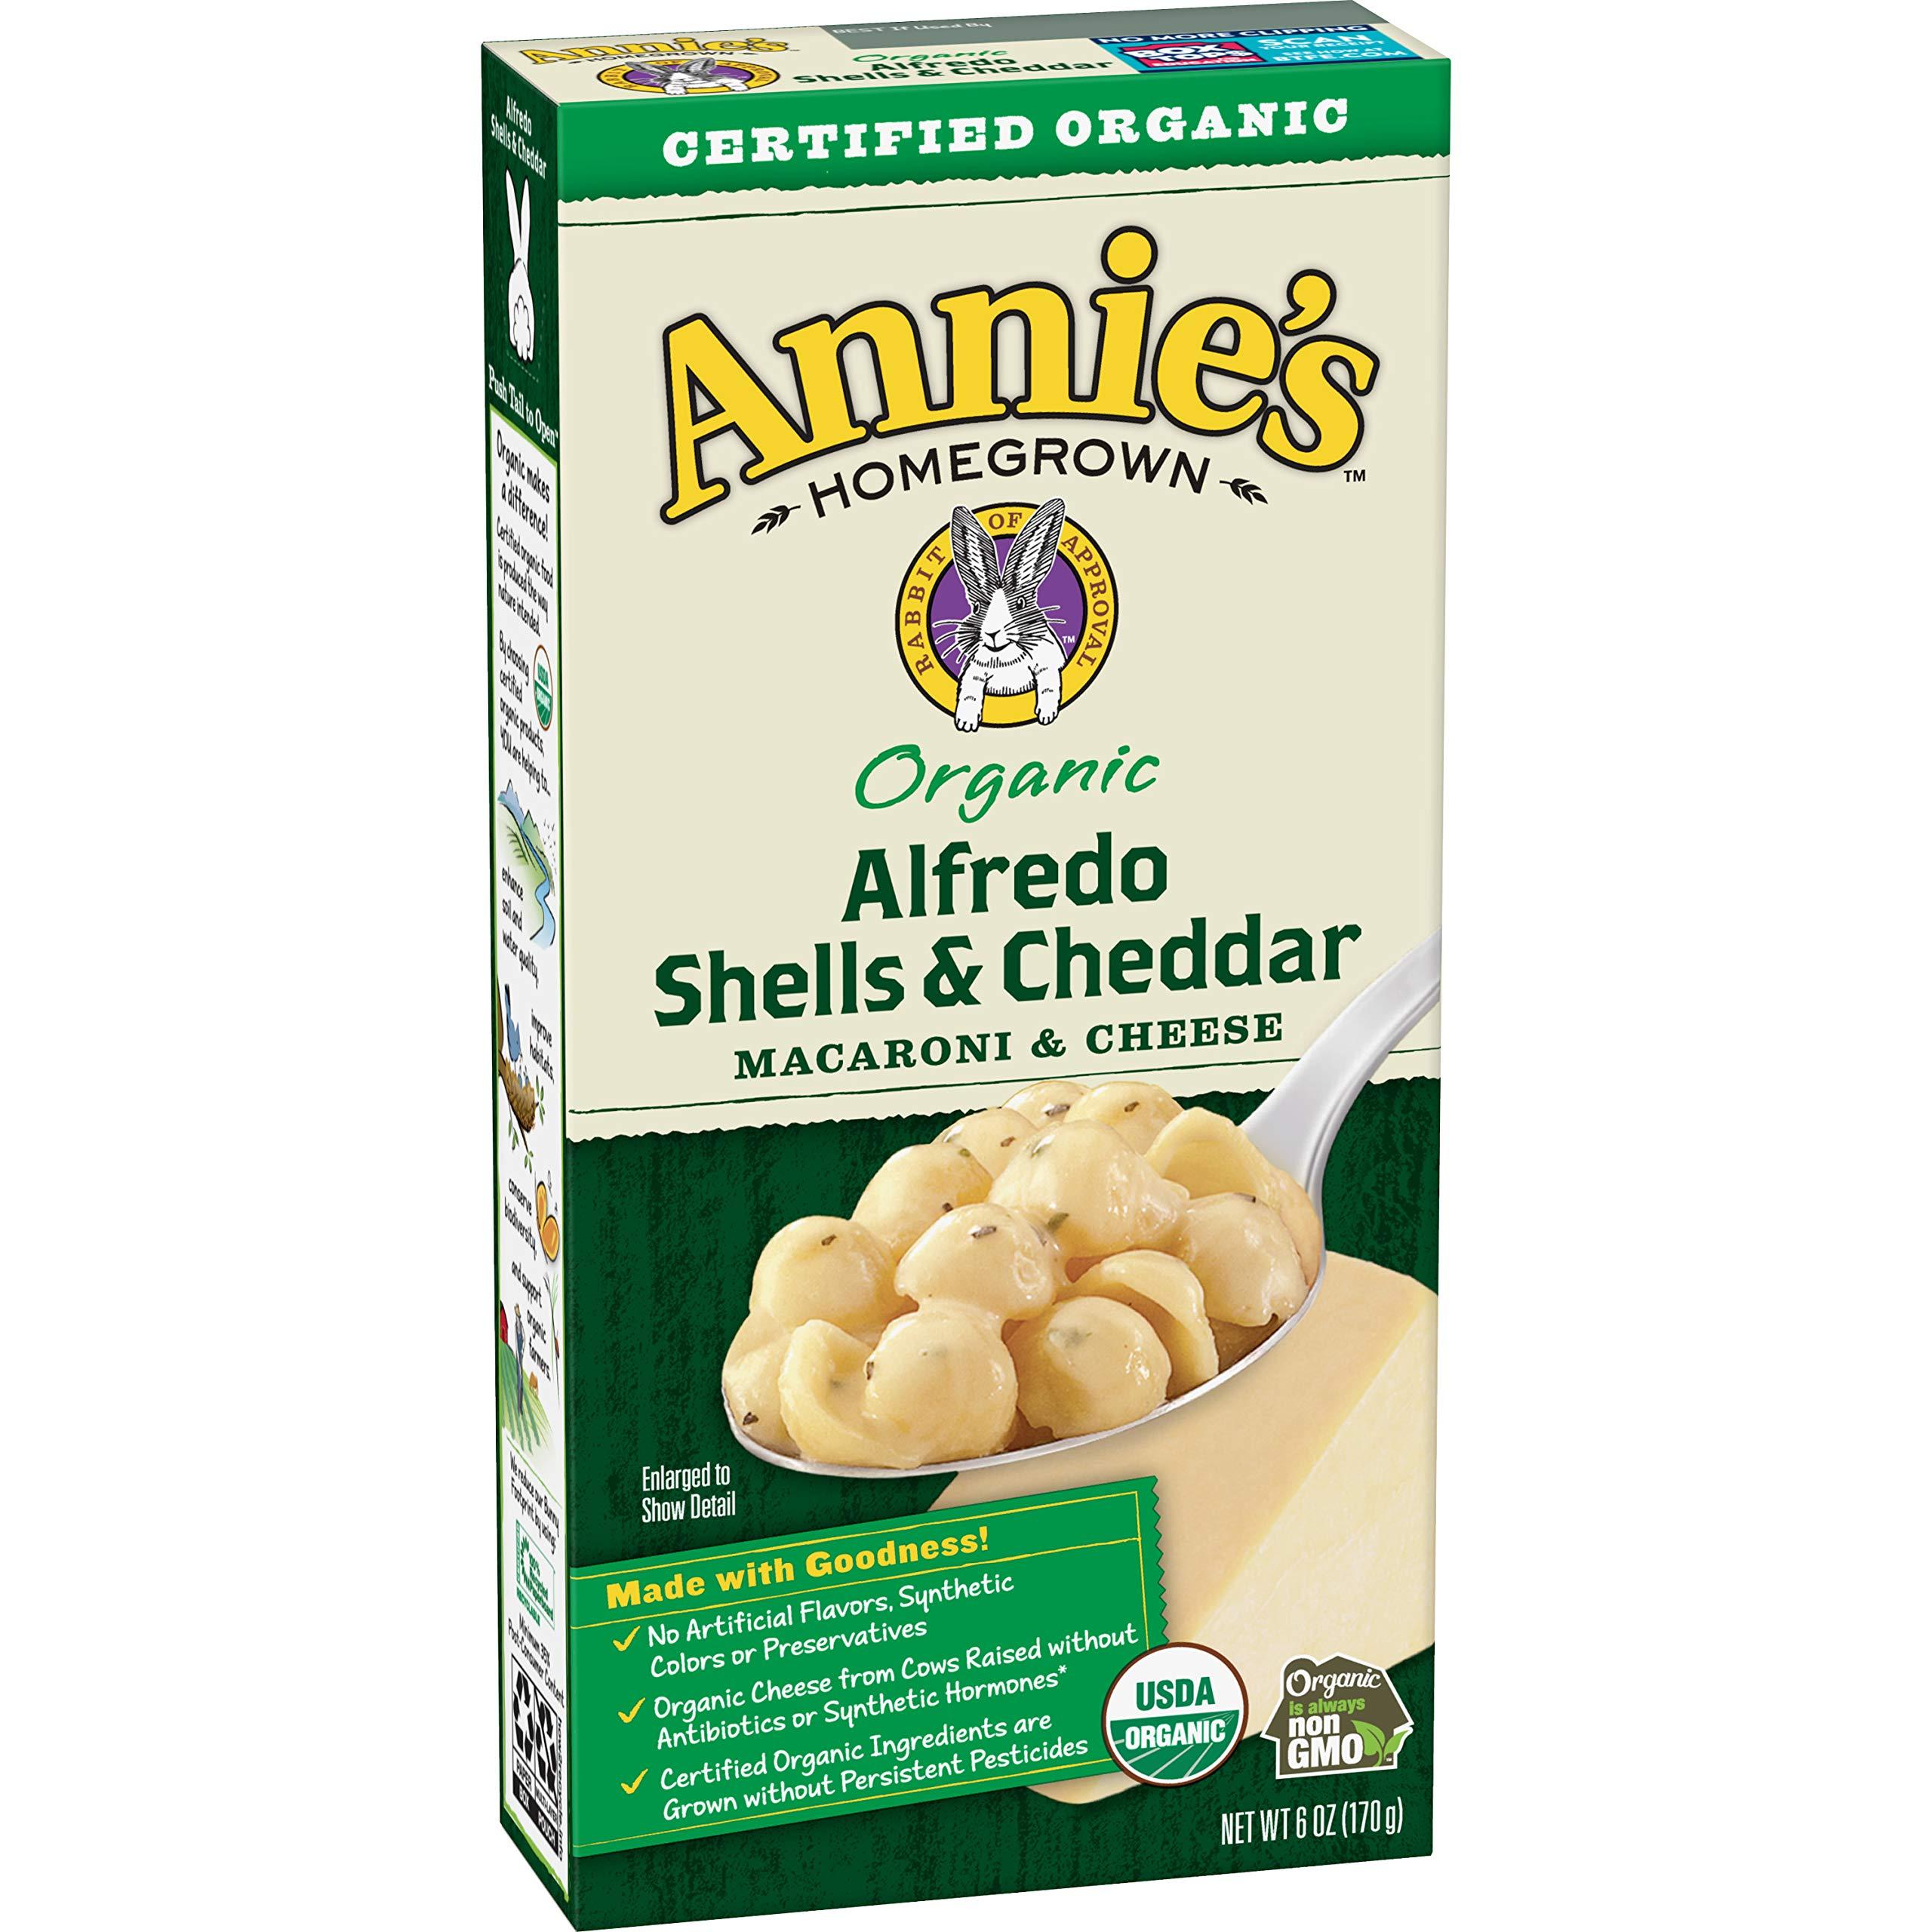 Annie's Organic Alfredo Shells & Cheddar Macaroni and Cheese, 6 oz,12 Pack